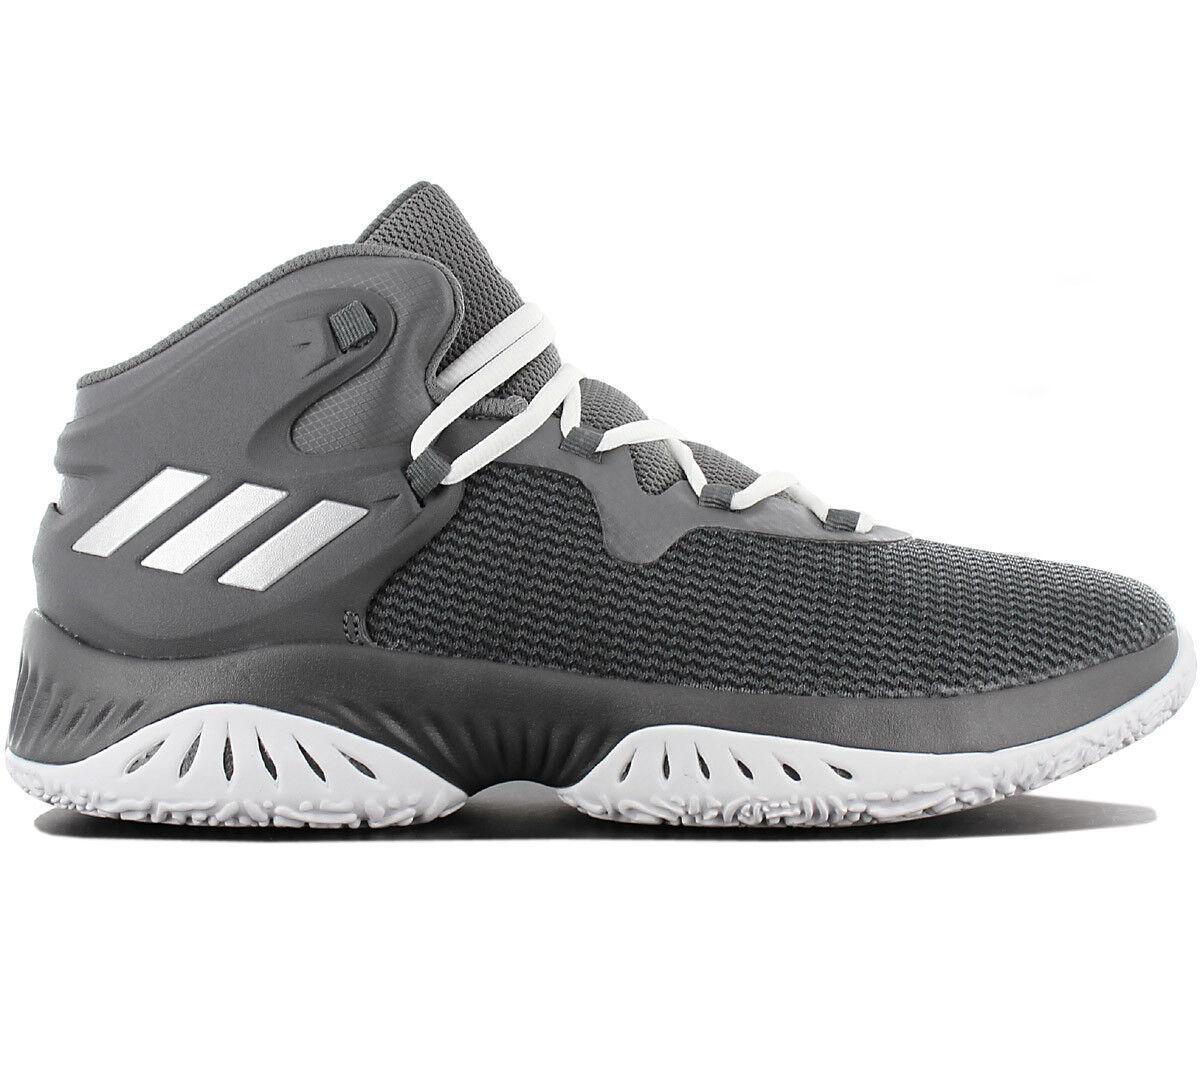 Adidas Explosive Bounce Men's Basketballshoe Basketball shoes Grey By3779